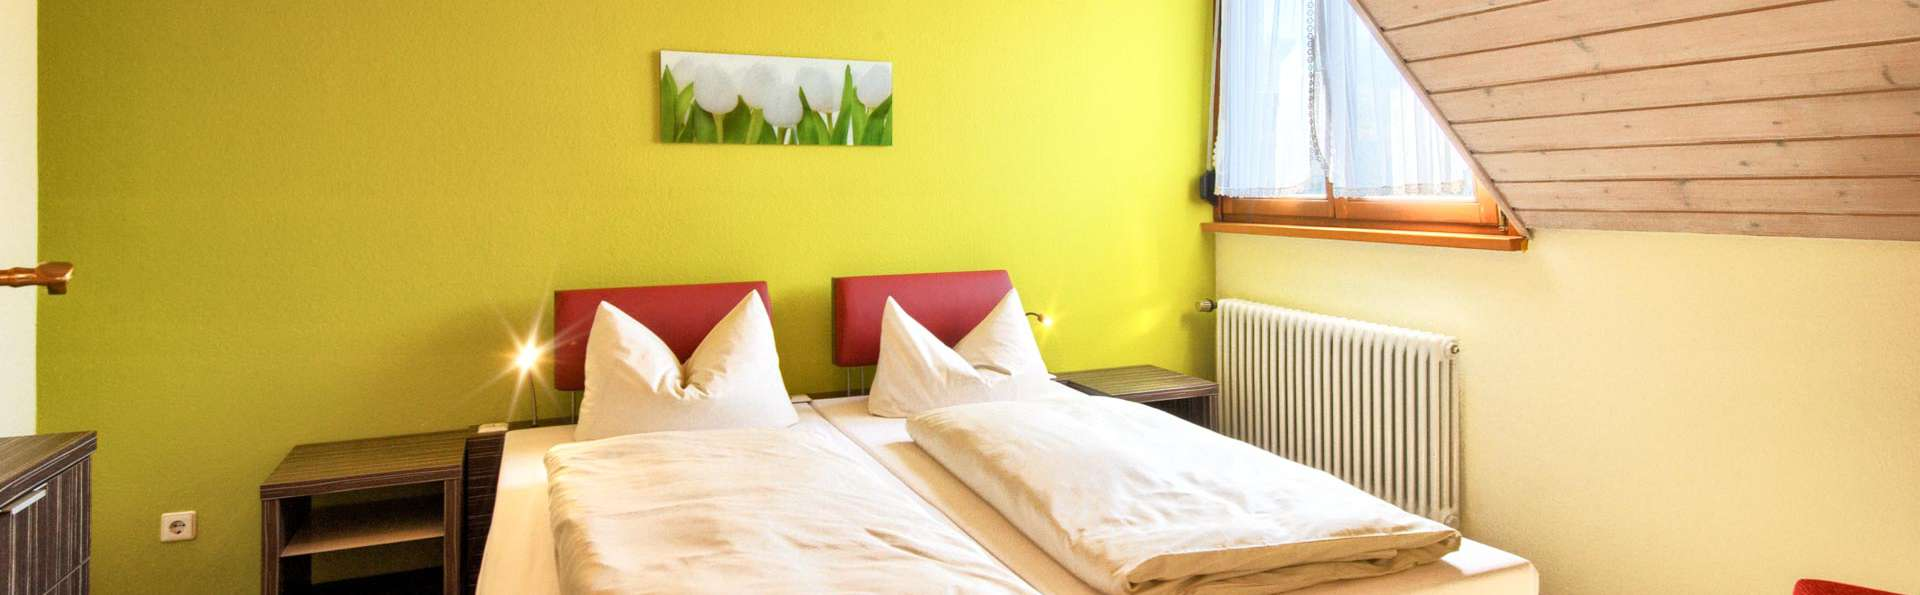 Ringhotel Aparthotel Badblick  - EDIT_APARTMENT_02.jpg